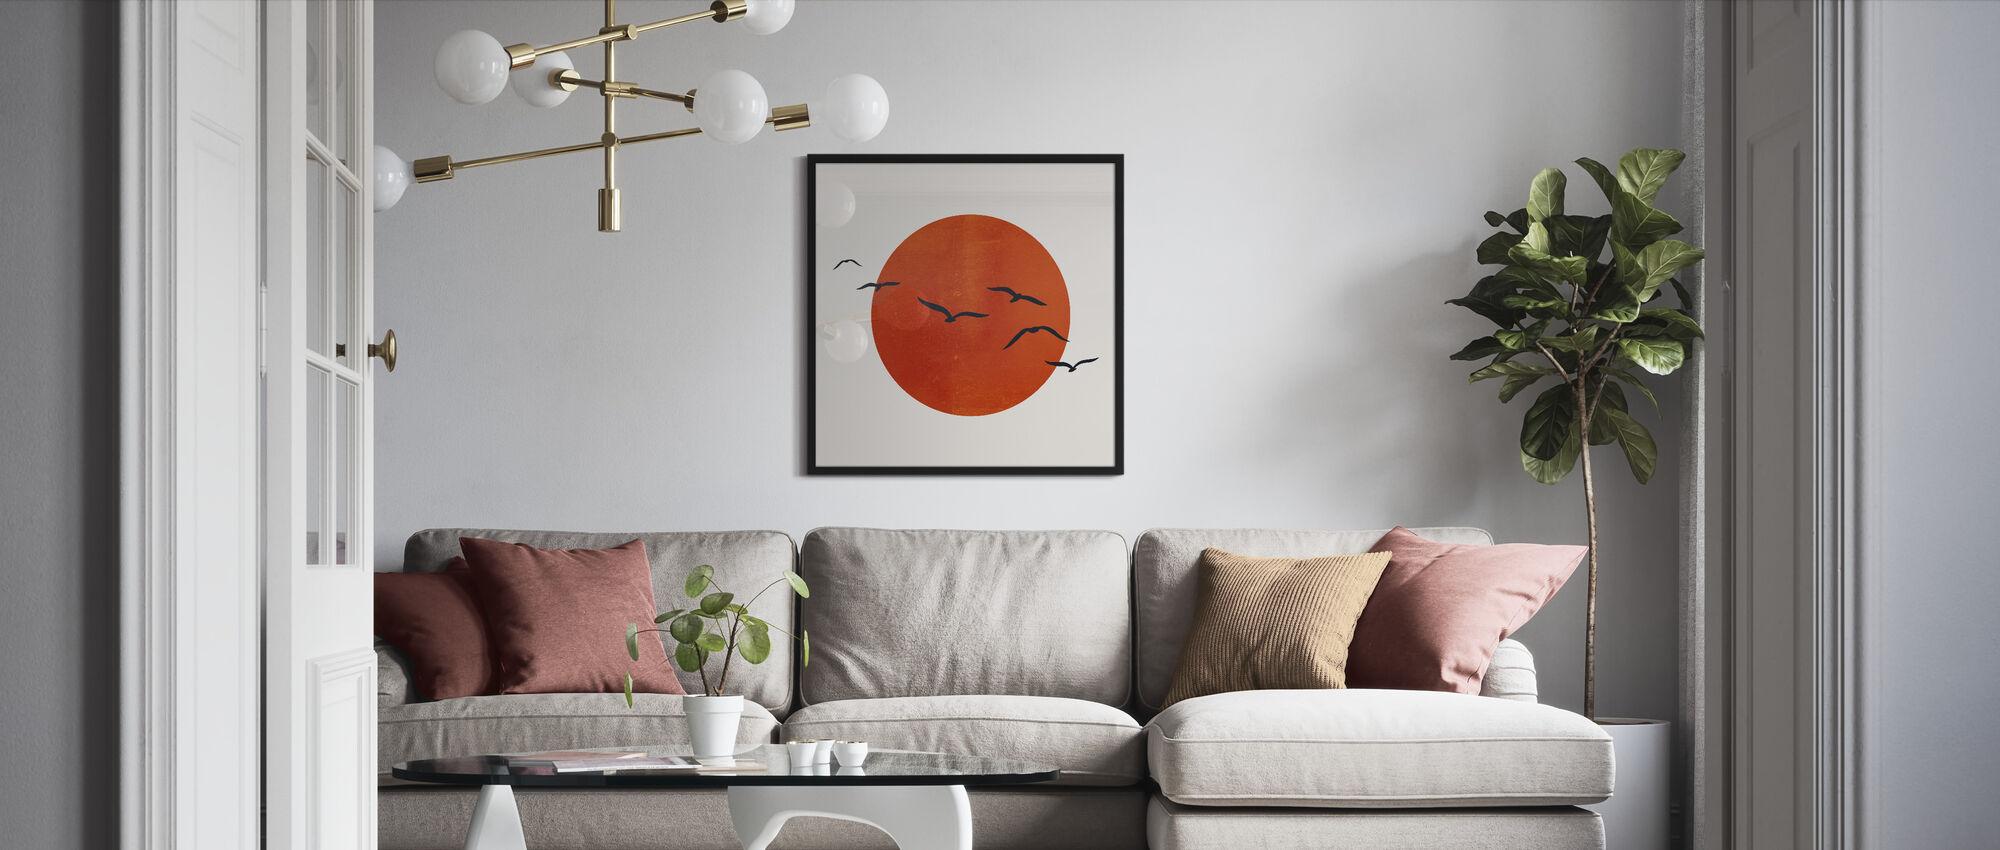 Up in the Sky - Framed print - Living Room